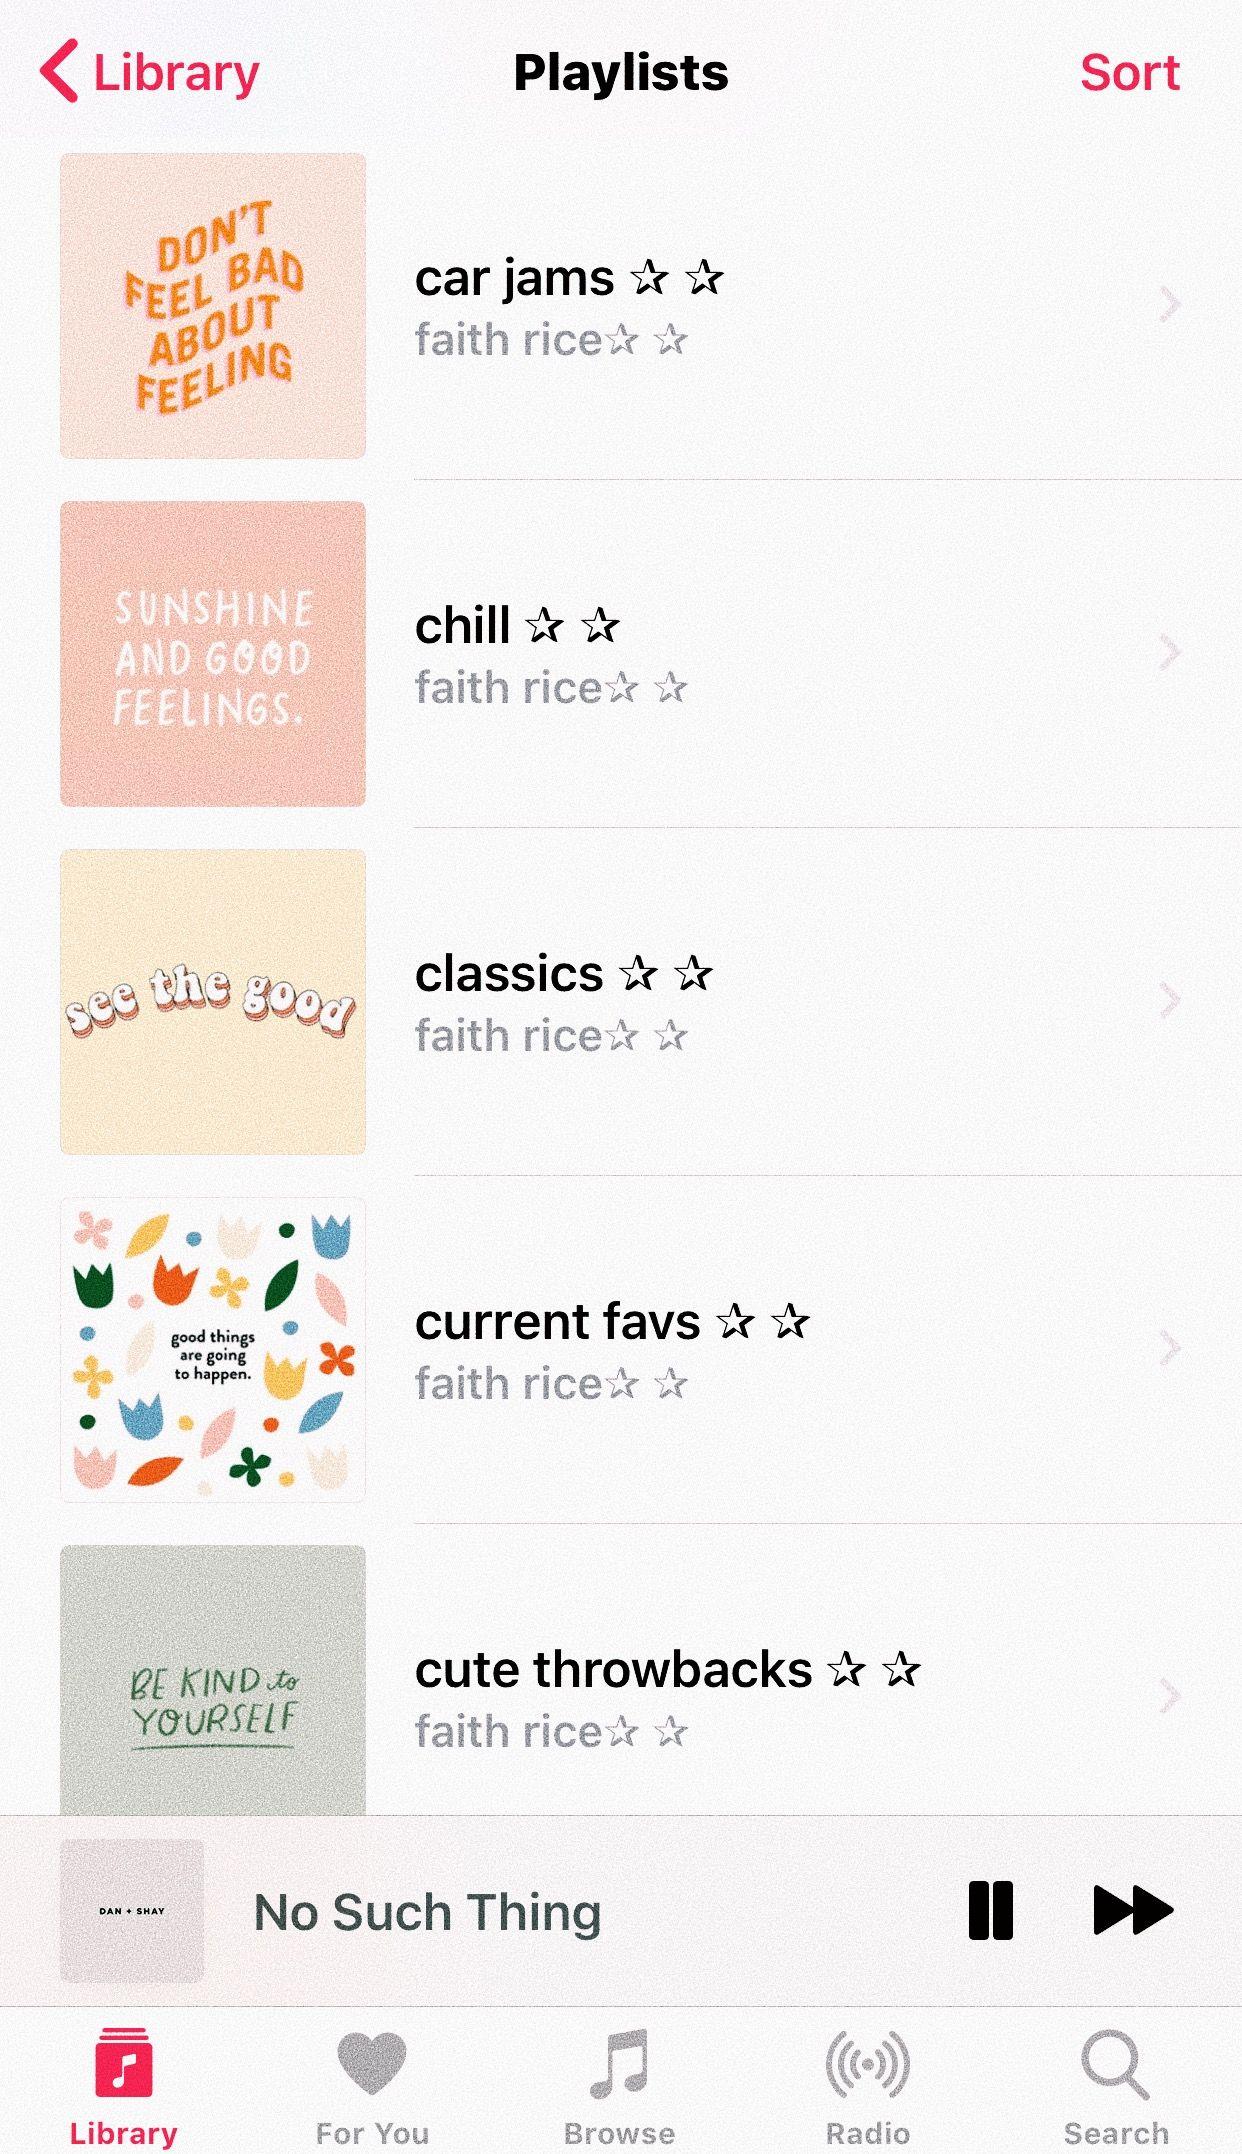 apple music faithrice6 spotify playlist covers artsy